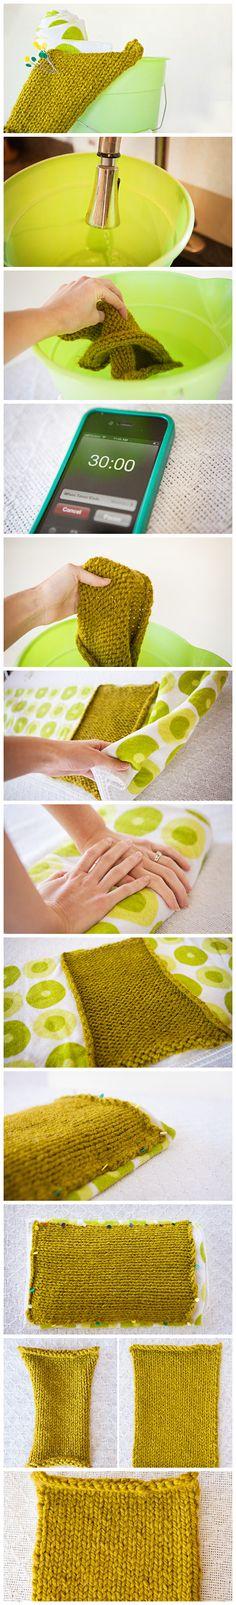 How to block a knitting project via craft.tutsplus.com. #FreeTutorial #Knitting #Blocking